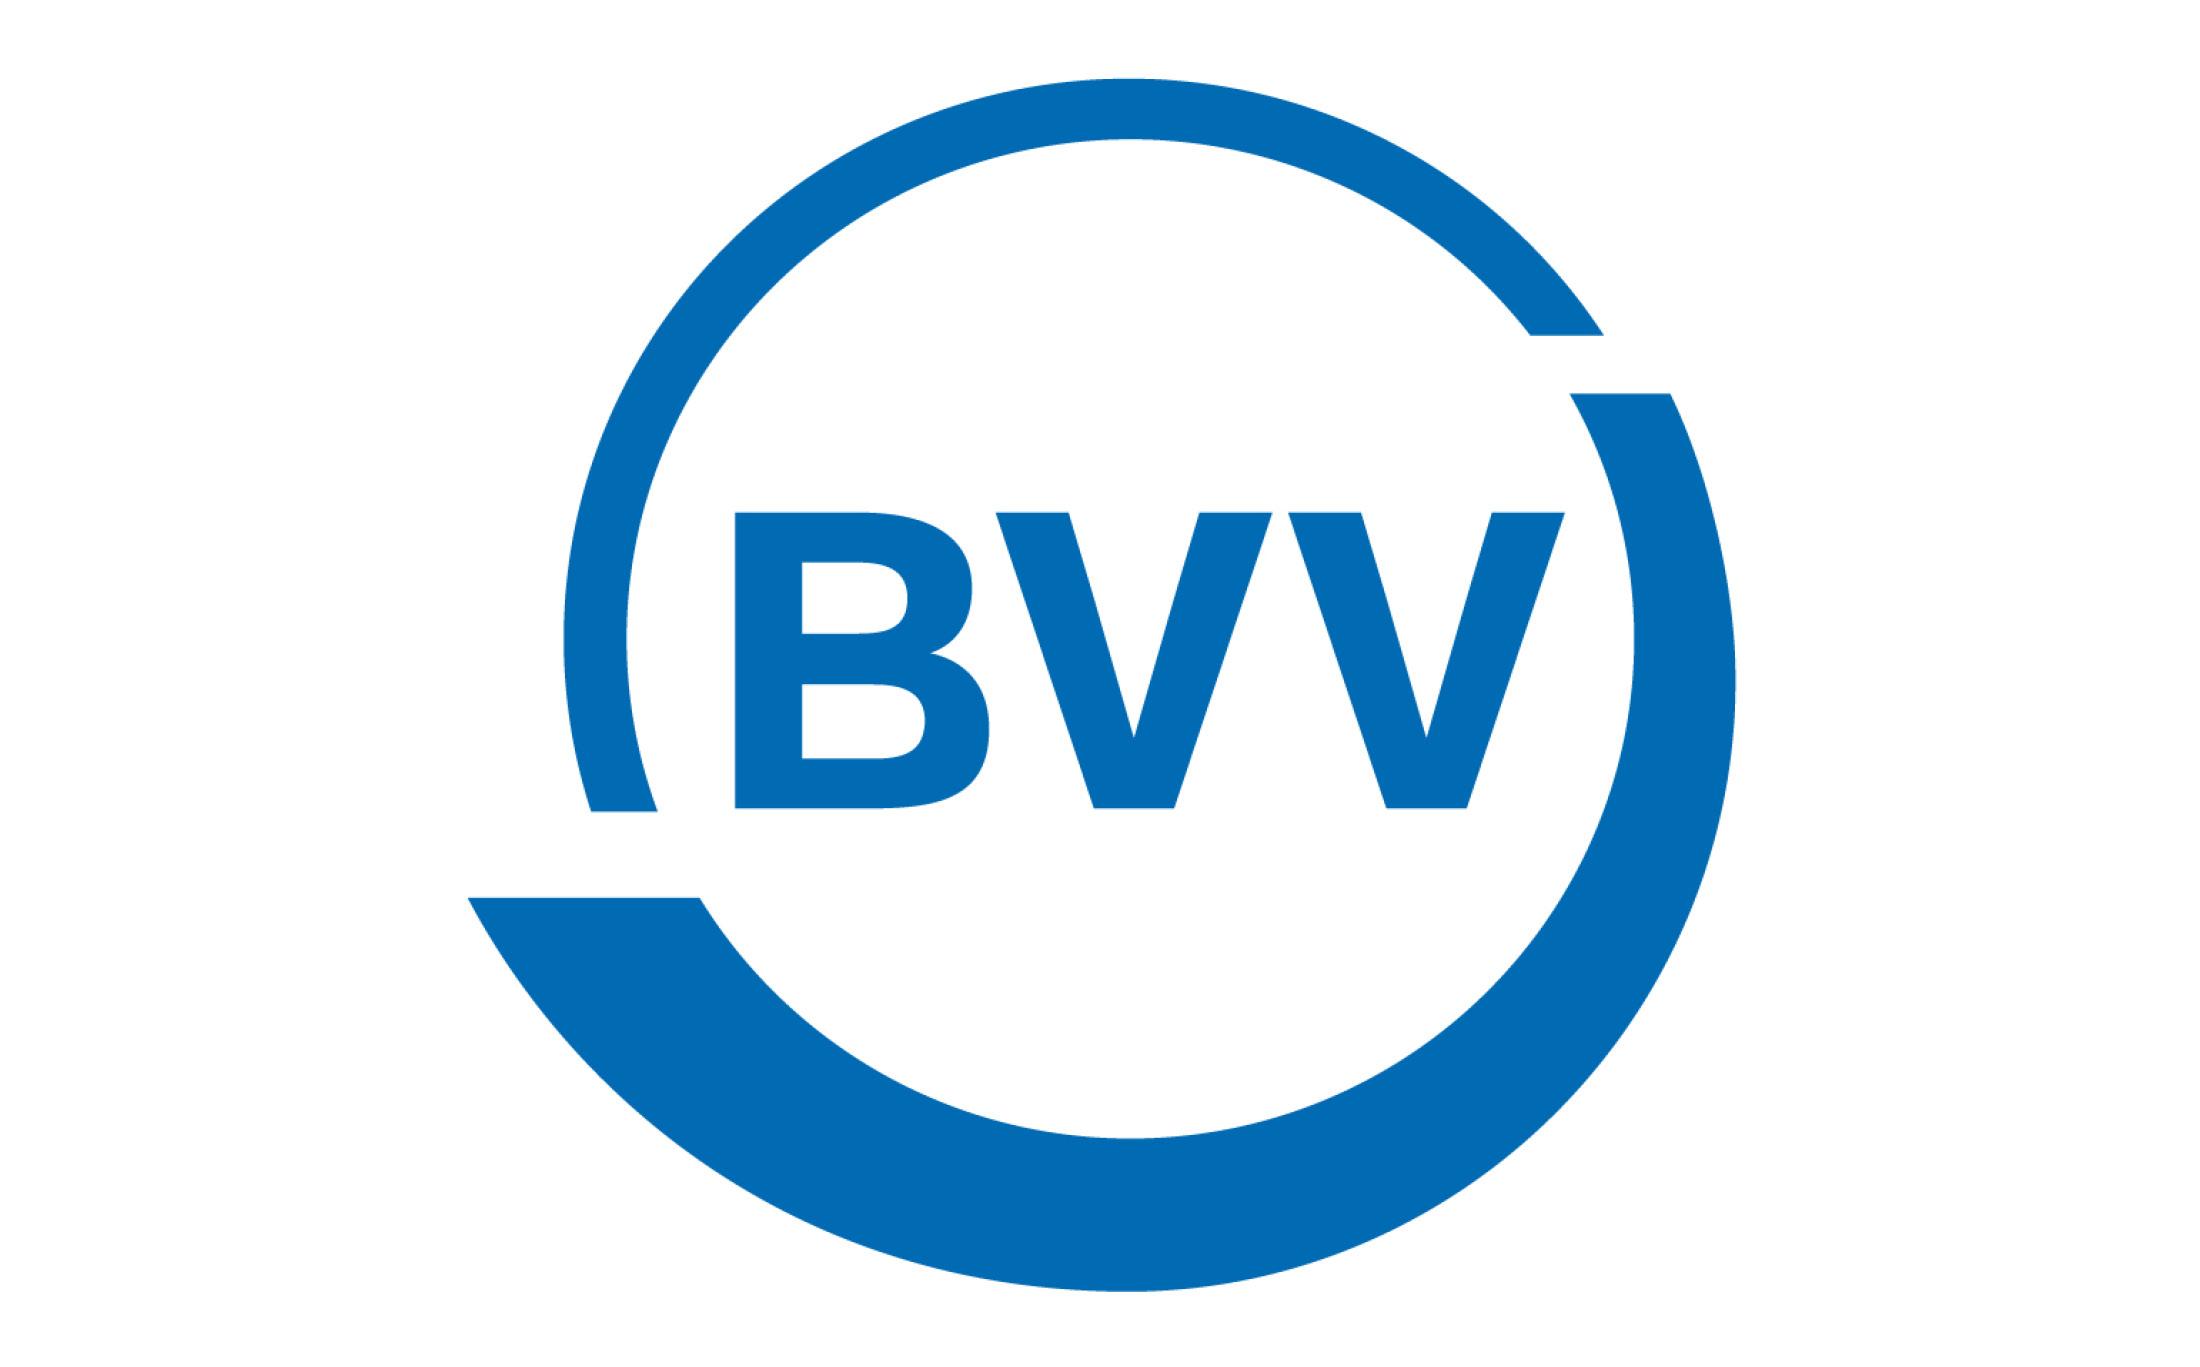 BVV Logo photo - 1